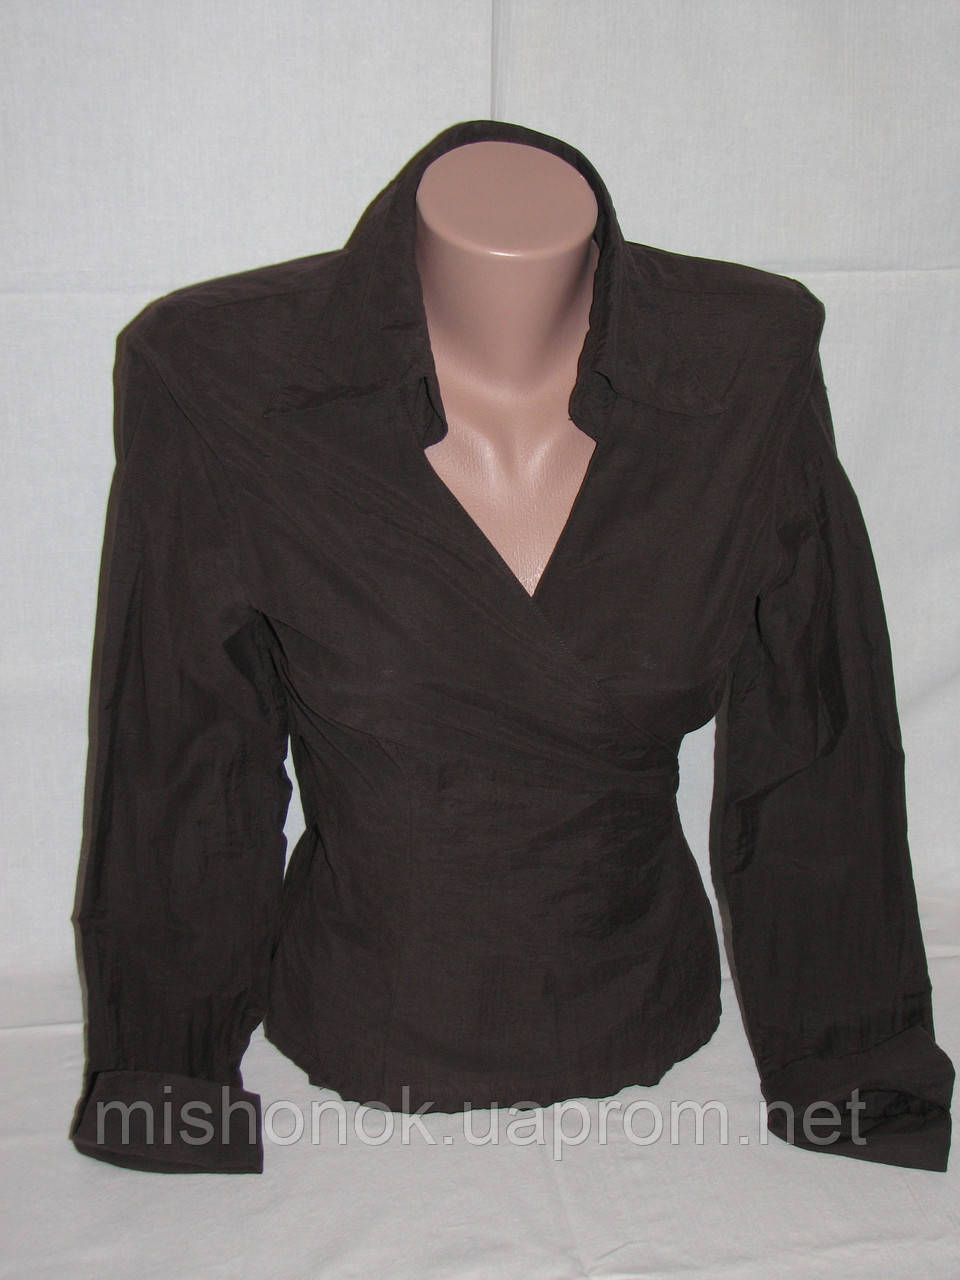 a66f2f29c6c Коричневая блузка-рубашка на запах Stradivarius р.M - купить по ...